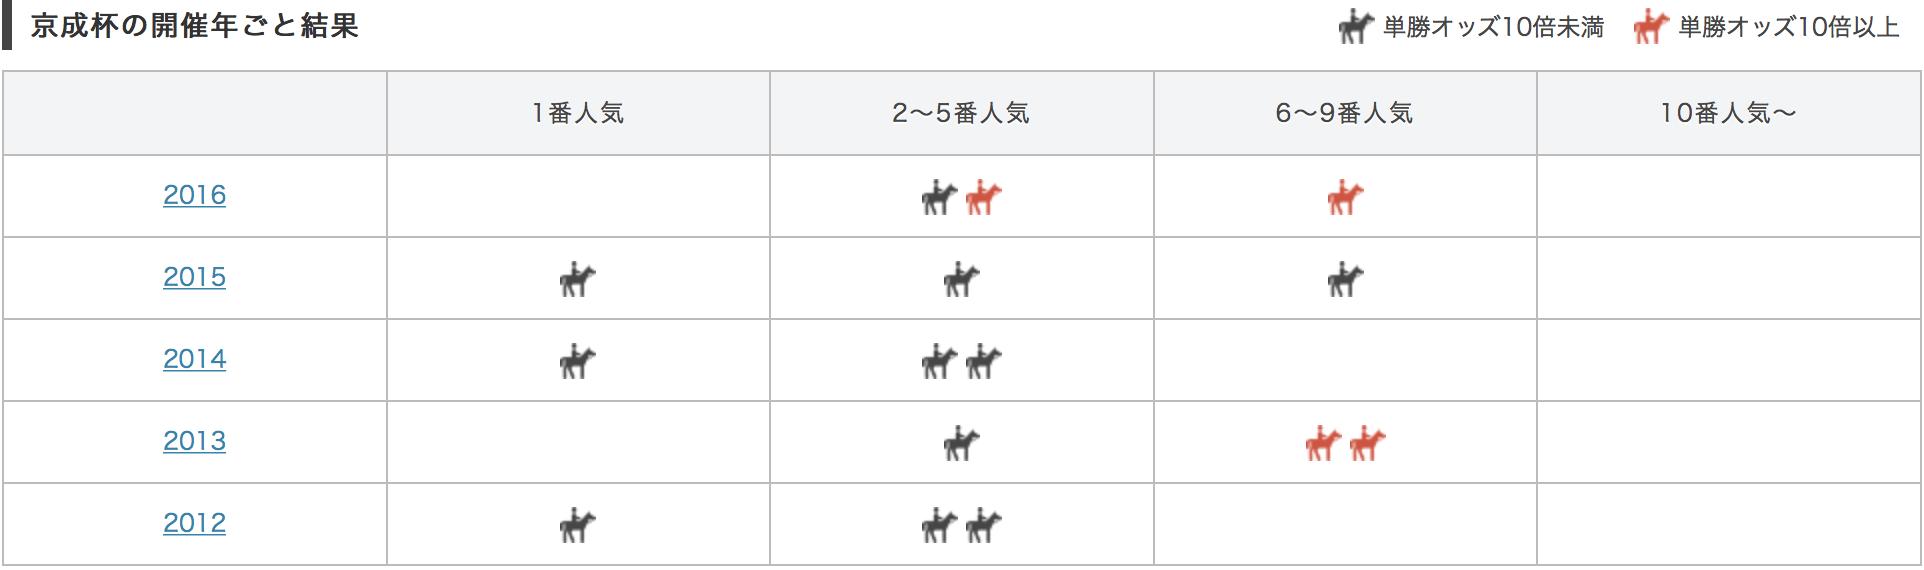 京成杯2017単勝人気別データ